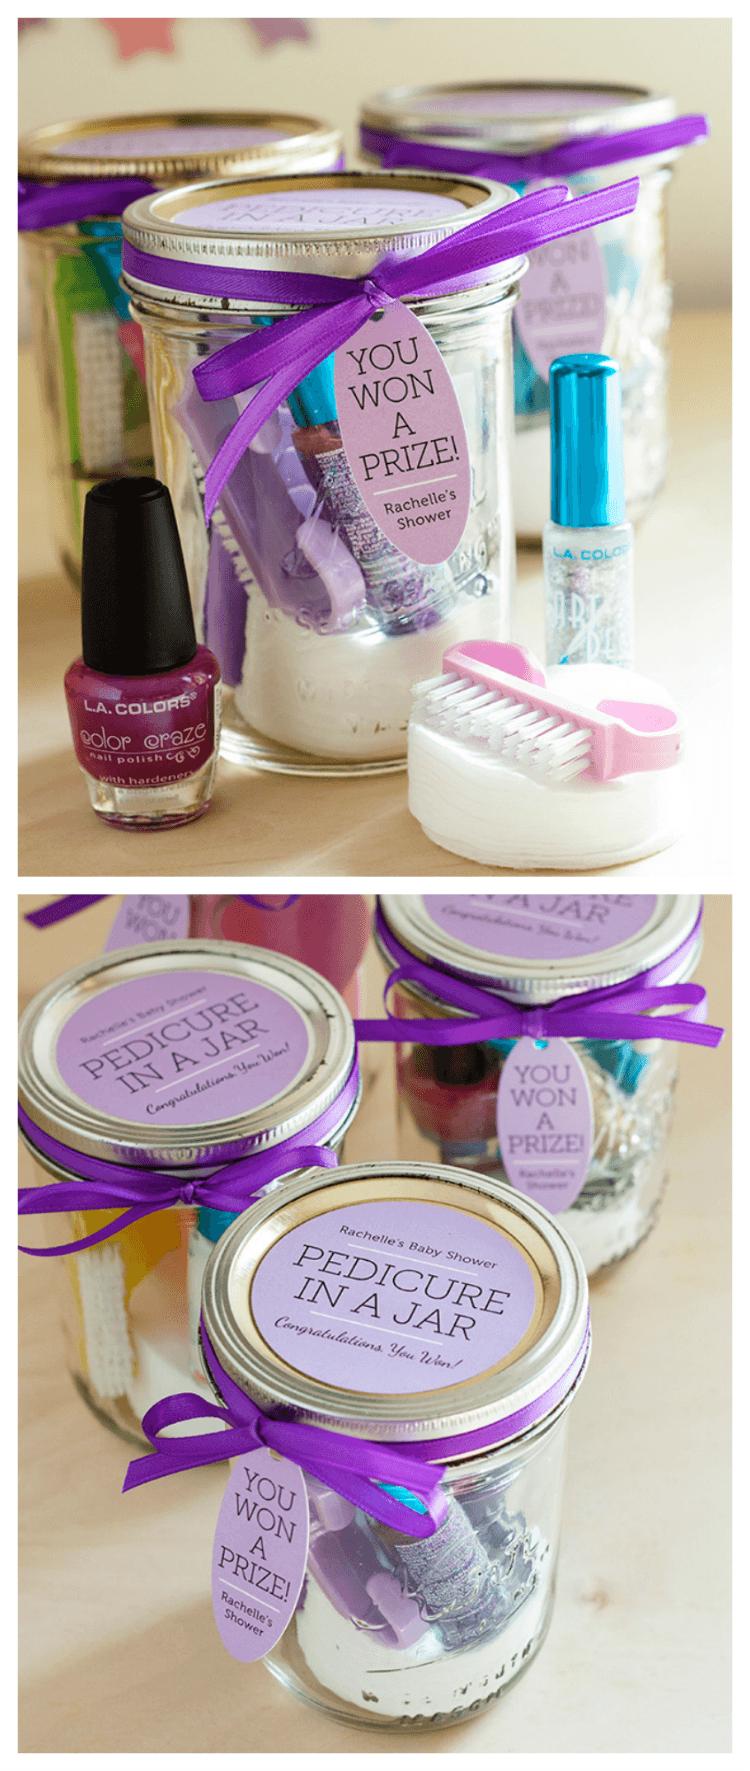 Pedicure in a jar gift idea